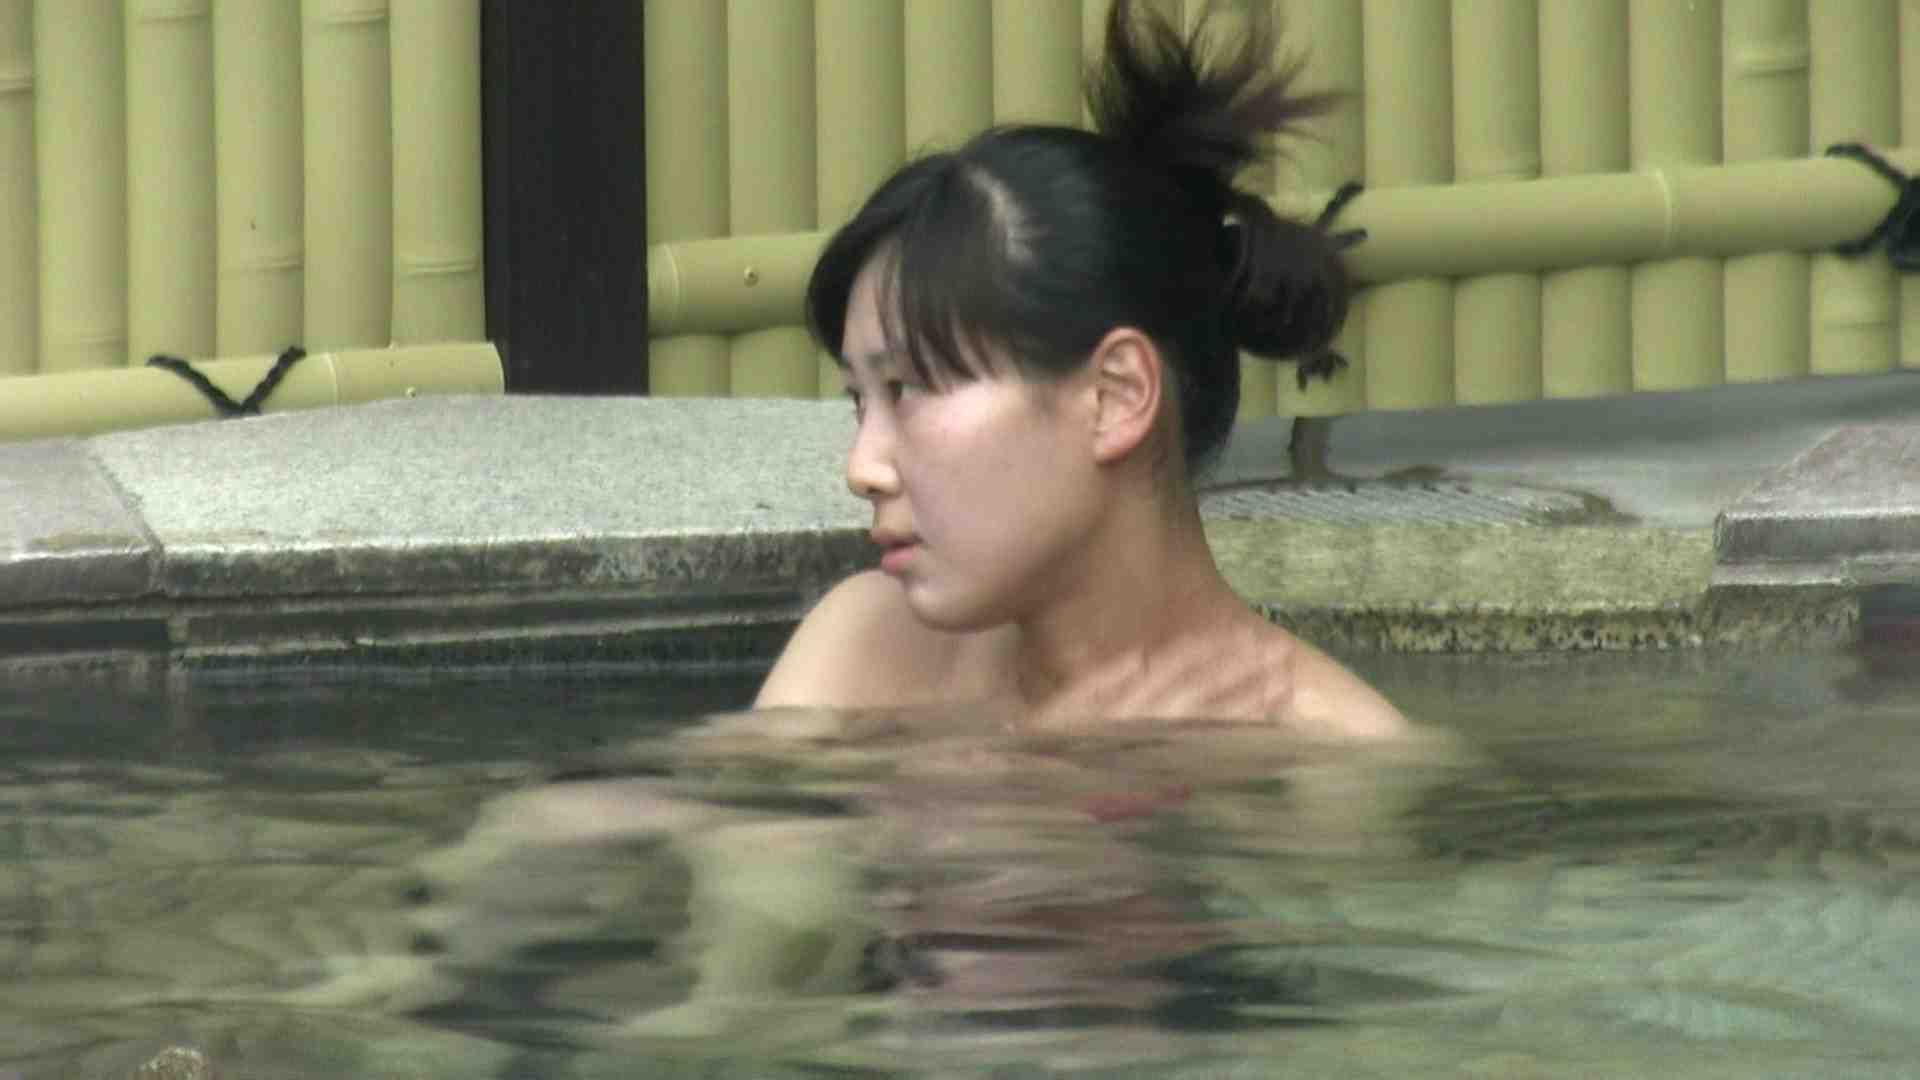 Aquaな露天風呂Vol.665 露天  24連発 12